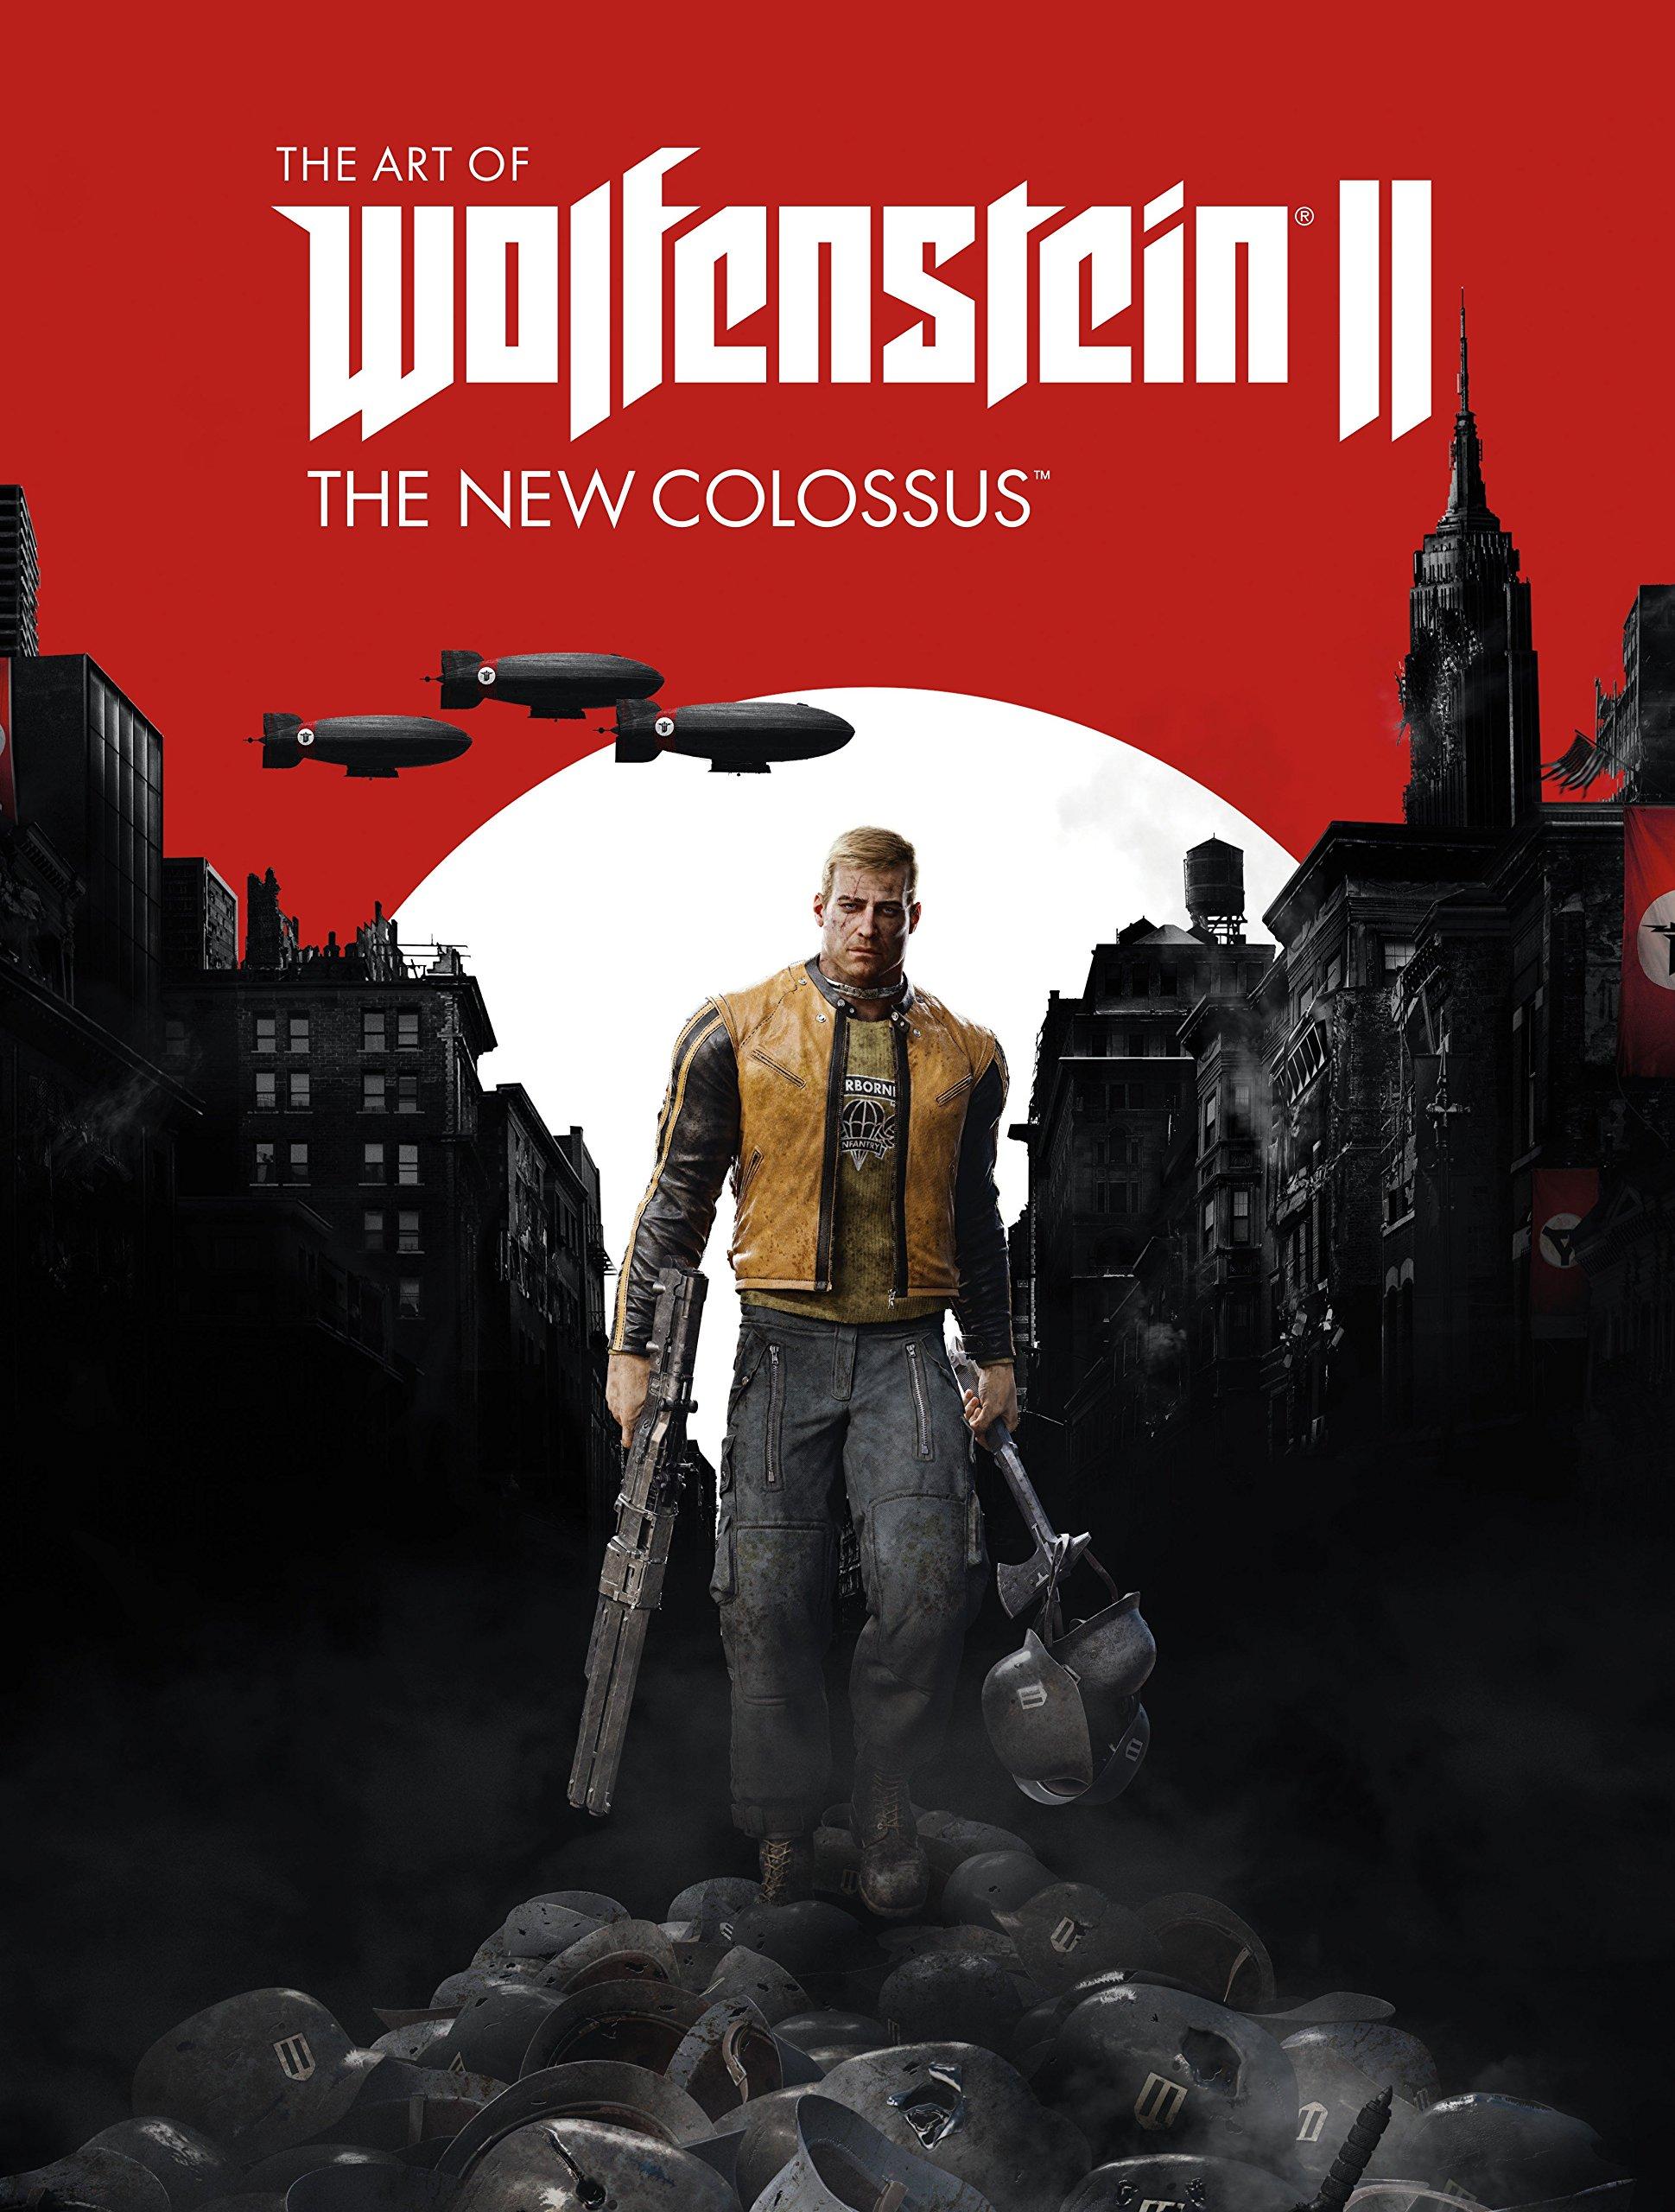 Amazon.com: The Art of Wolfenstein II: The New Colossus: 9781506705279: MachineGames, Bethesda Softworks: Books